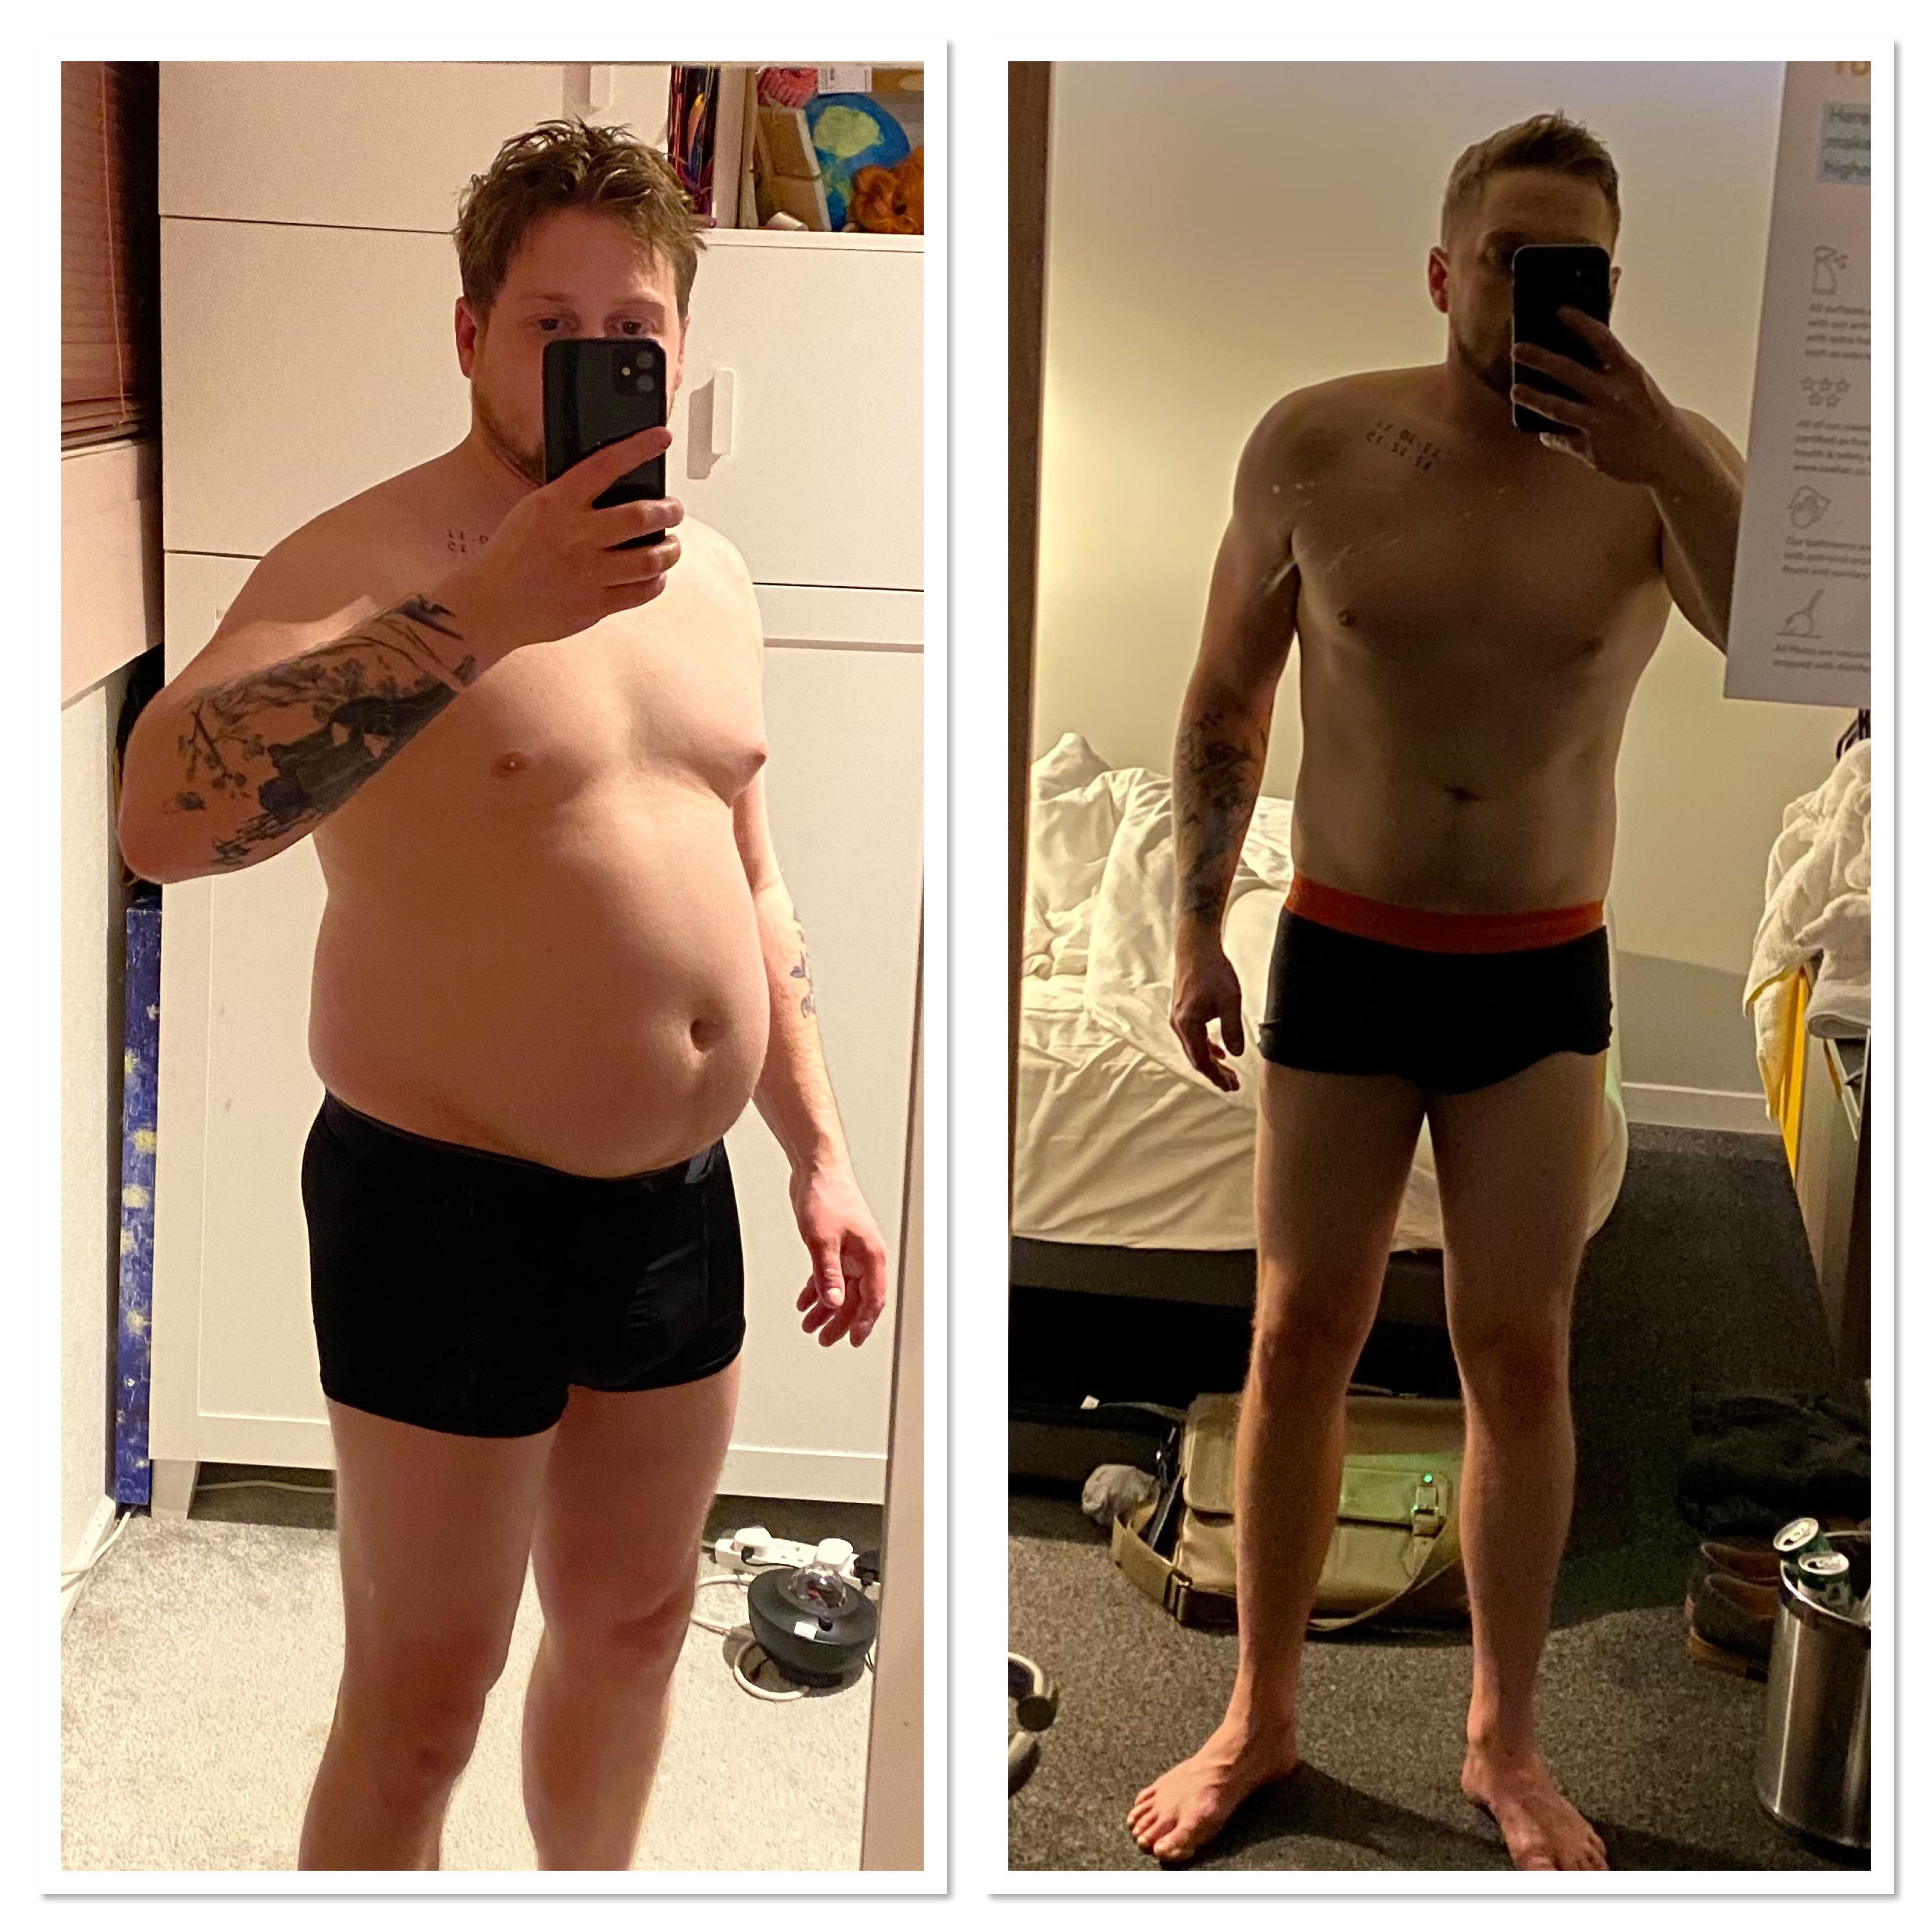 5'9 Male 29 lbs Weight Loss 198 lbs to 169 lbs